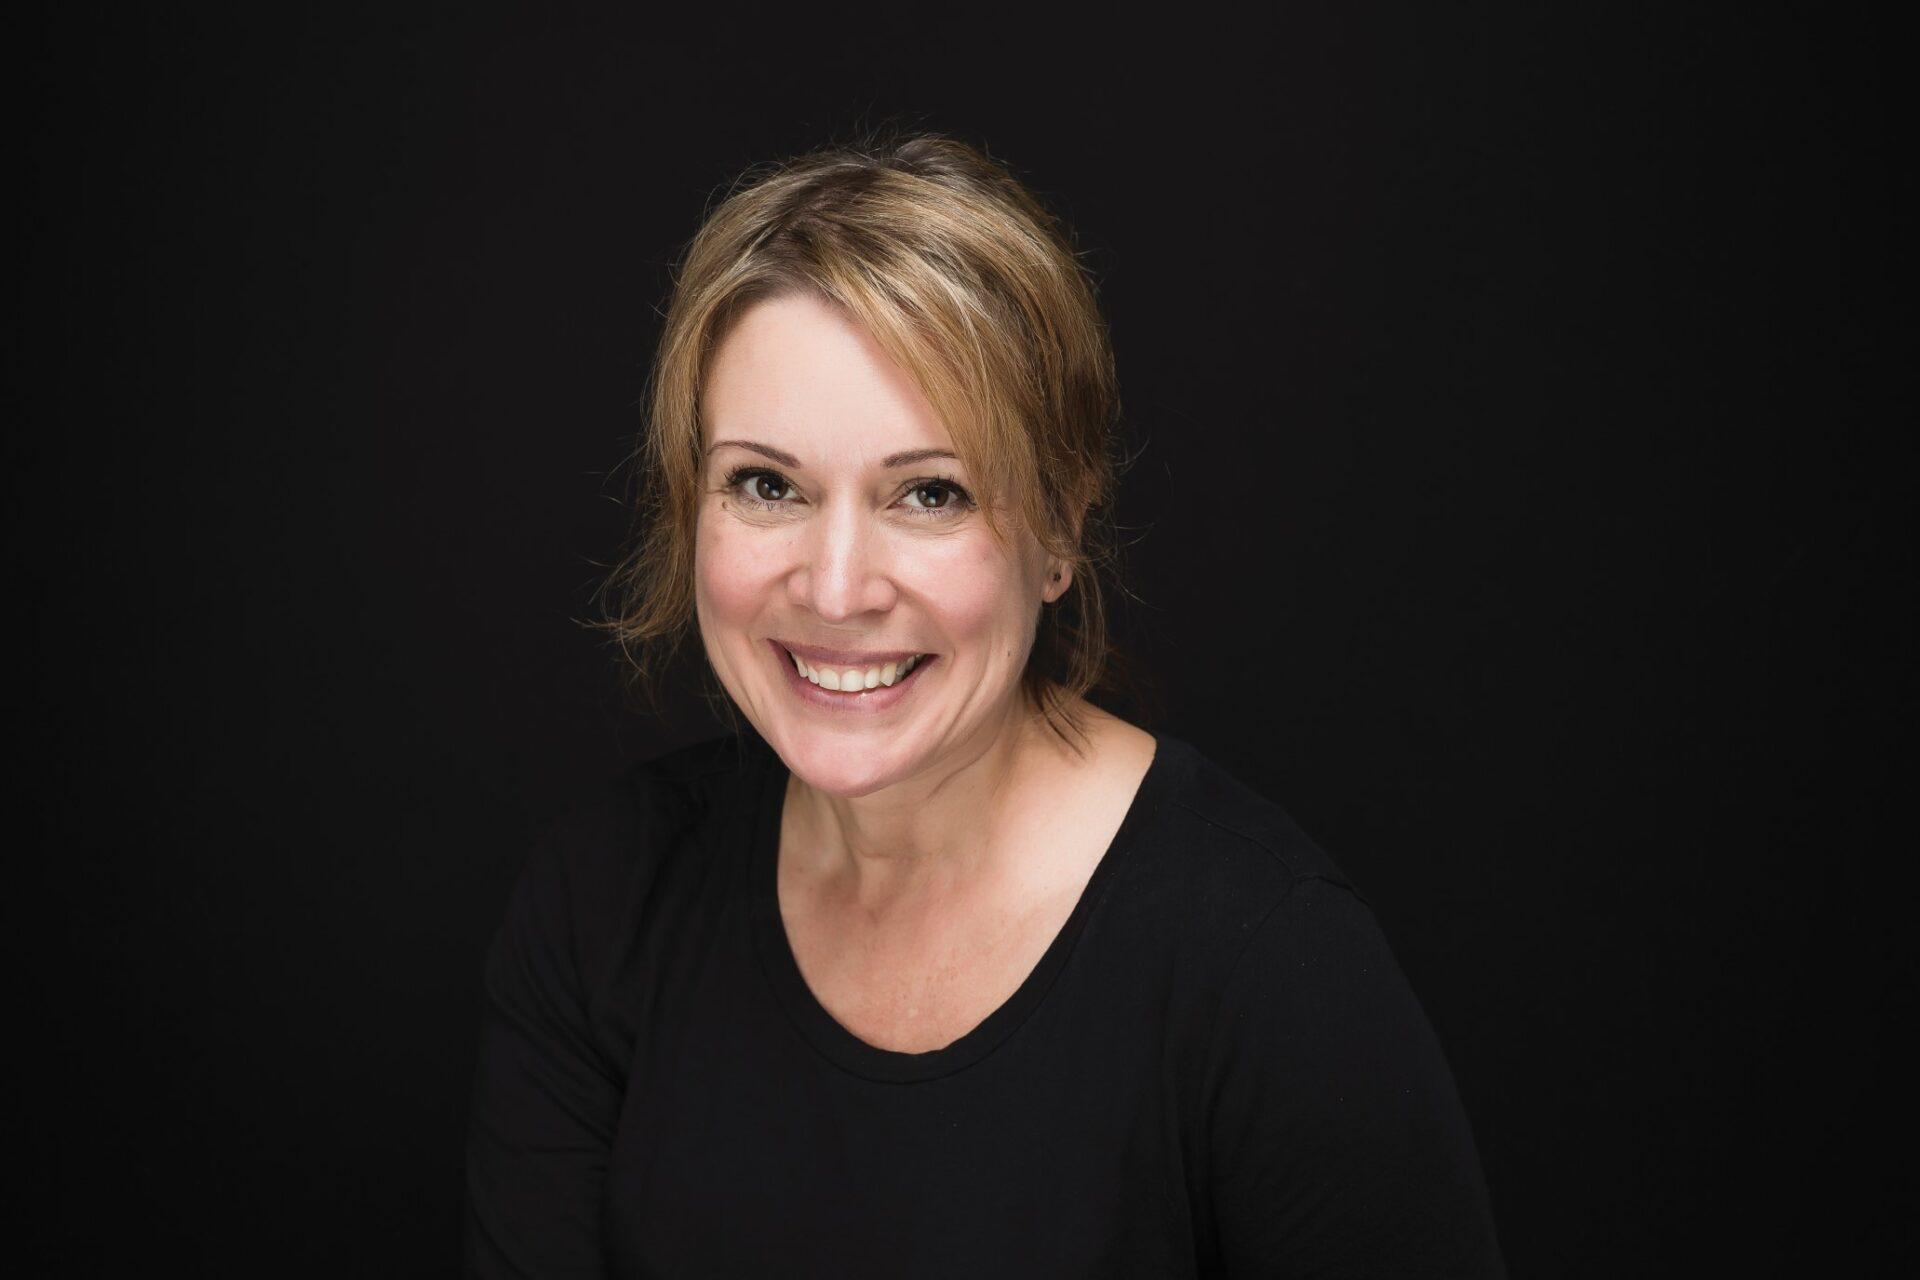 Author Cecilia Ekback